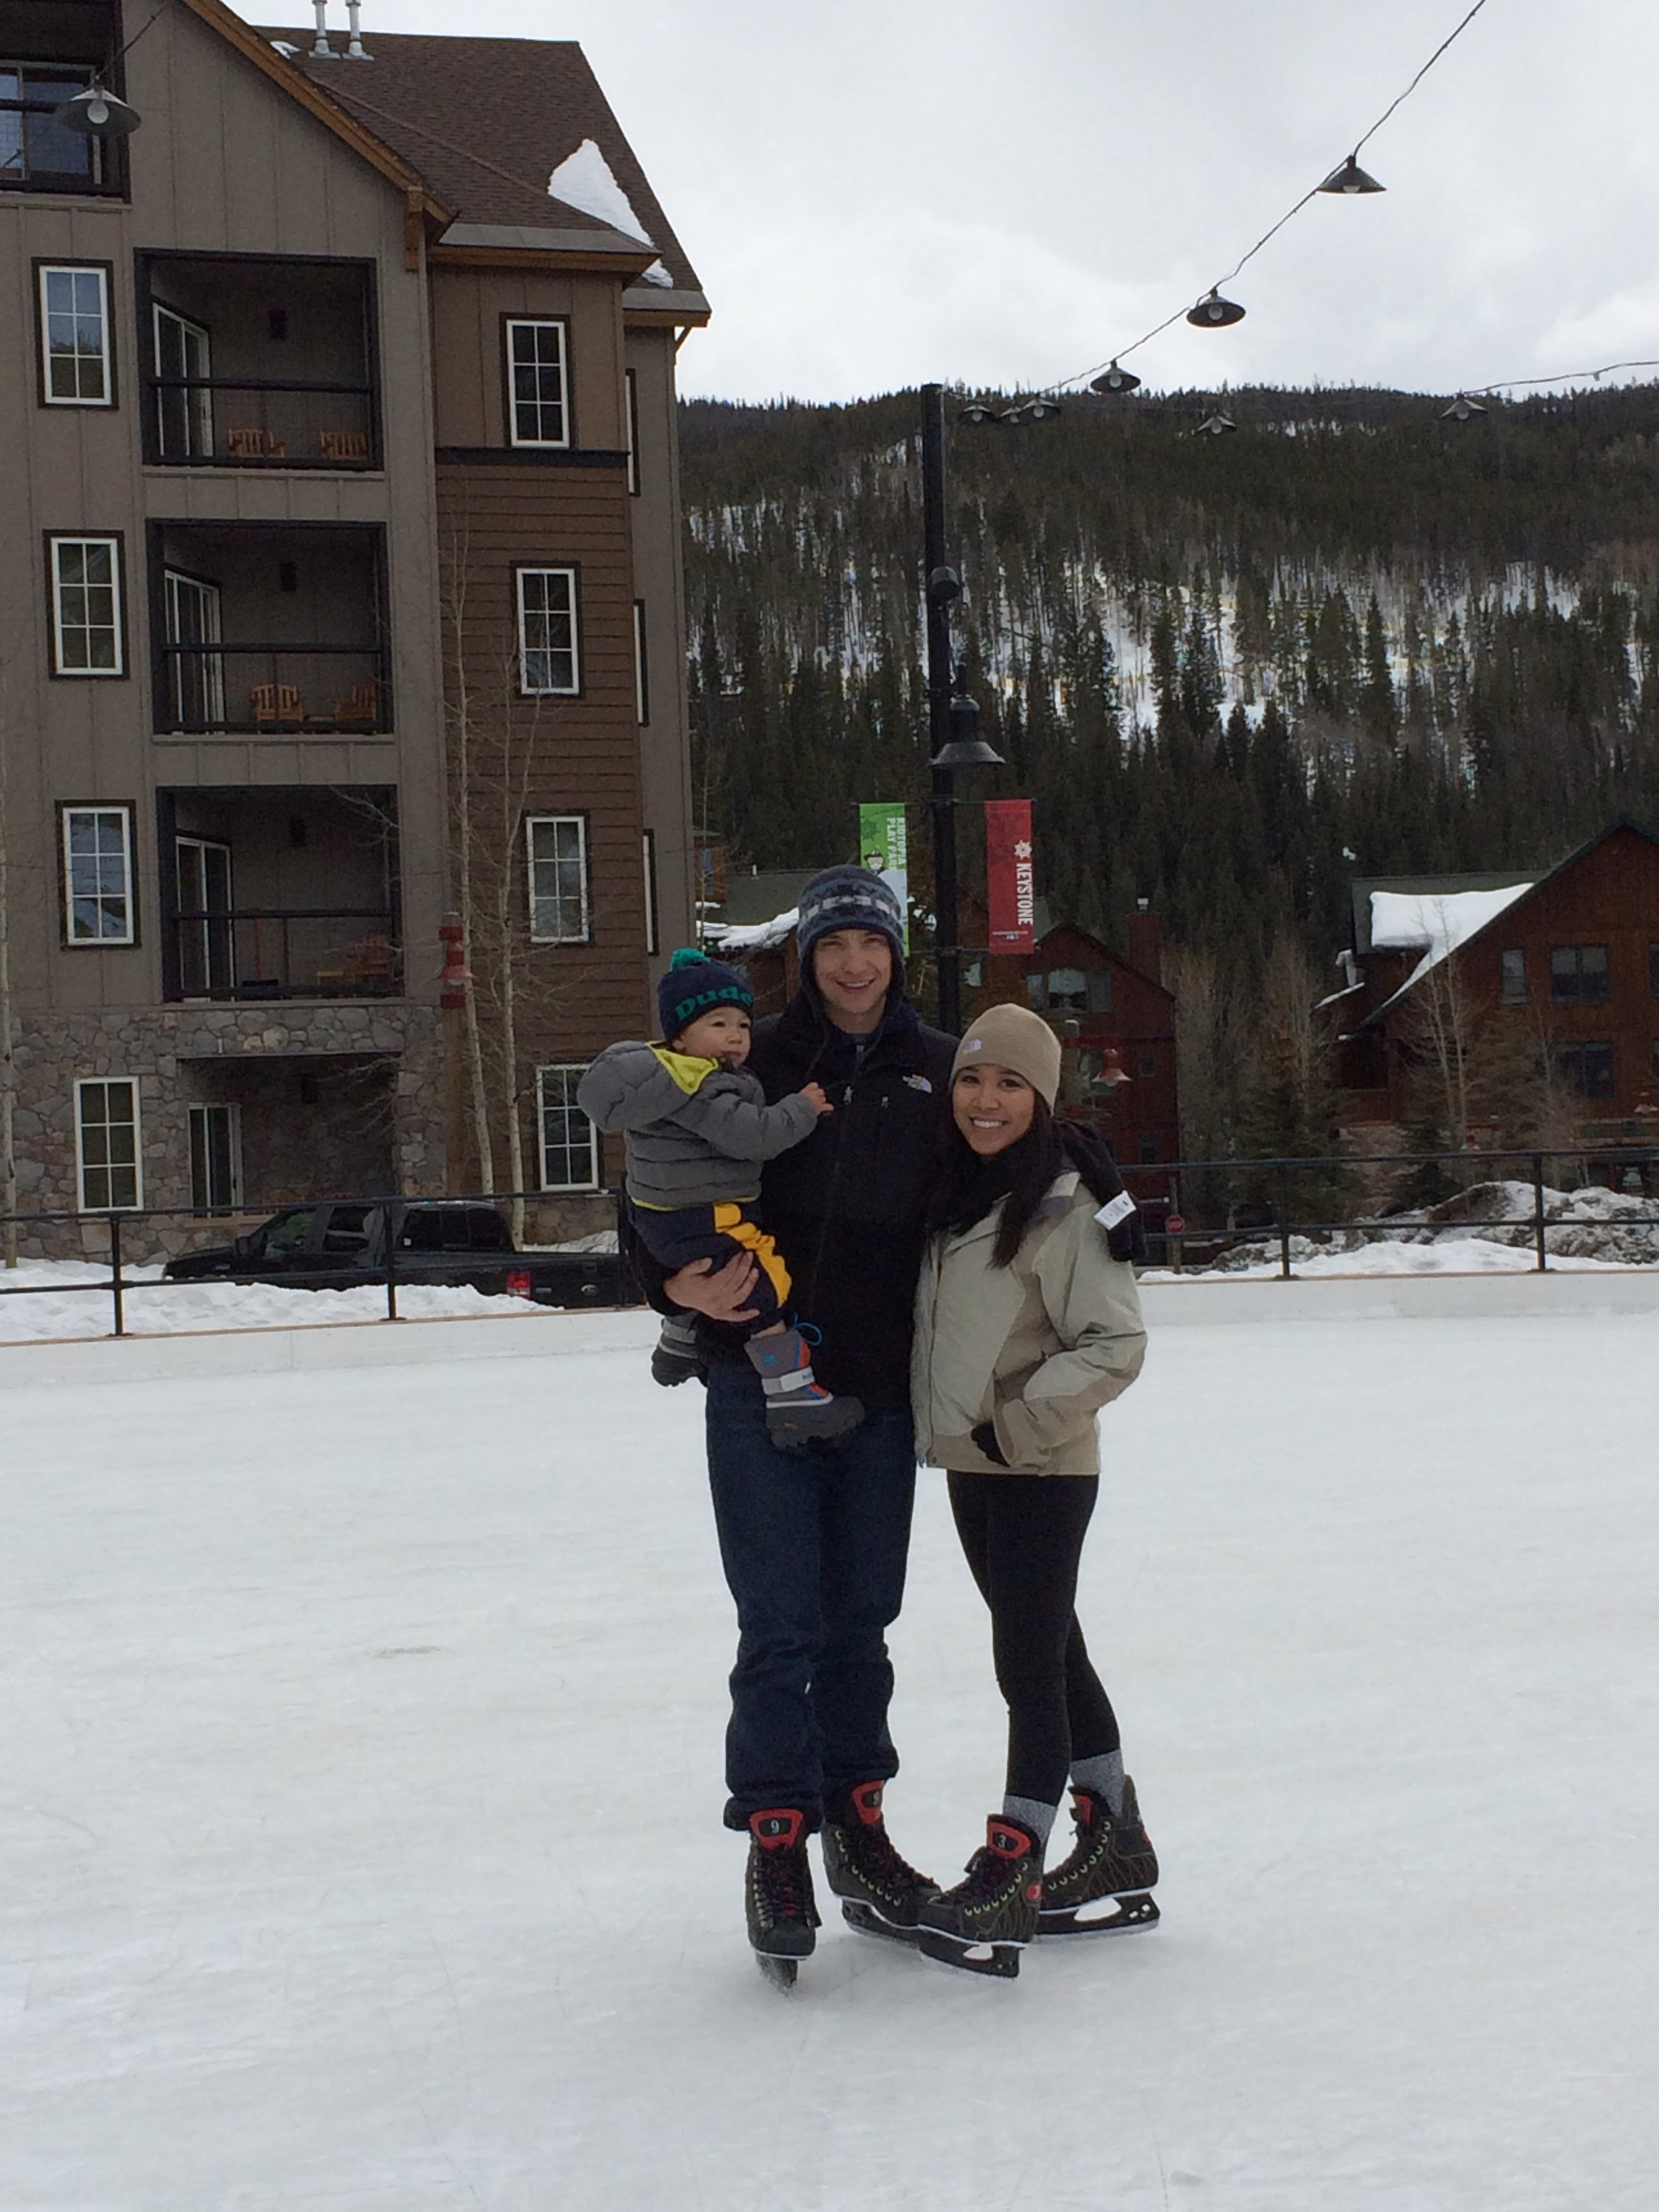 Keystone Colorado // ice skating